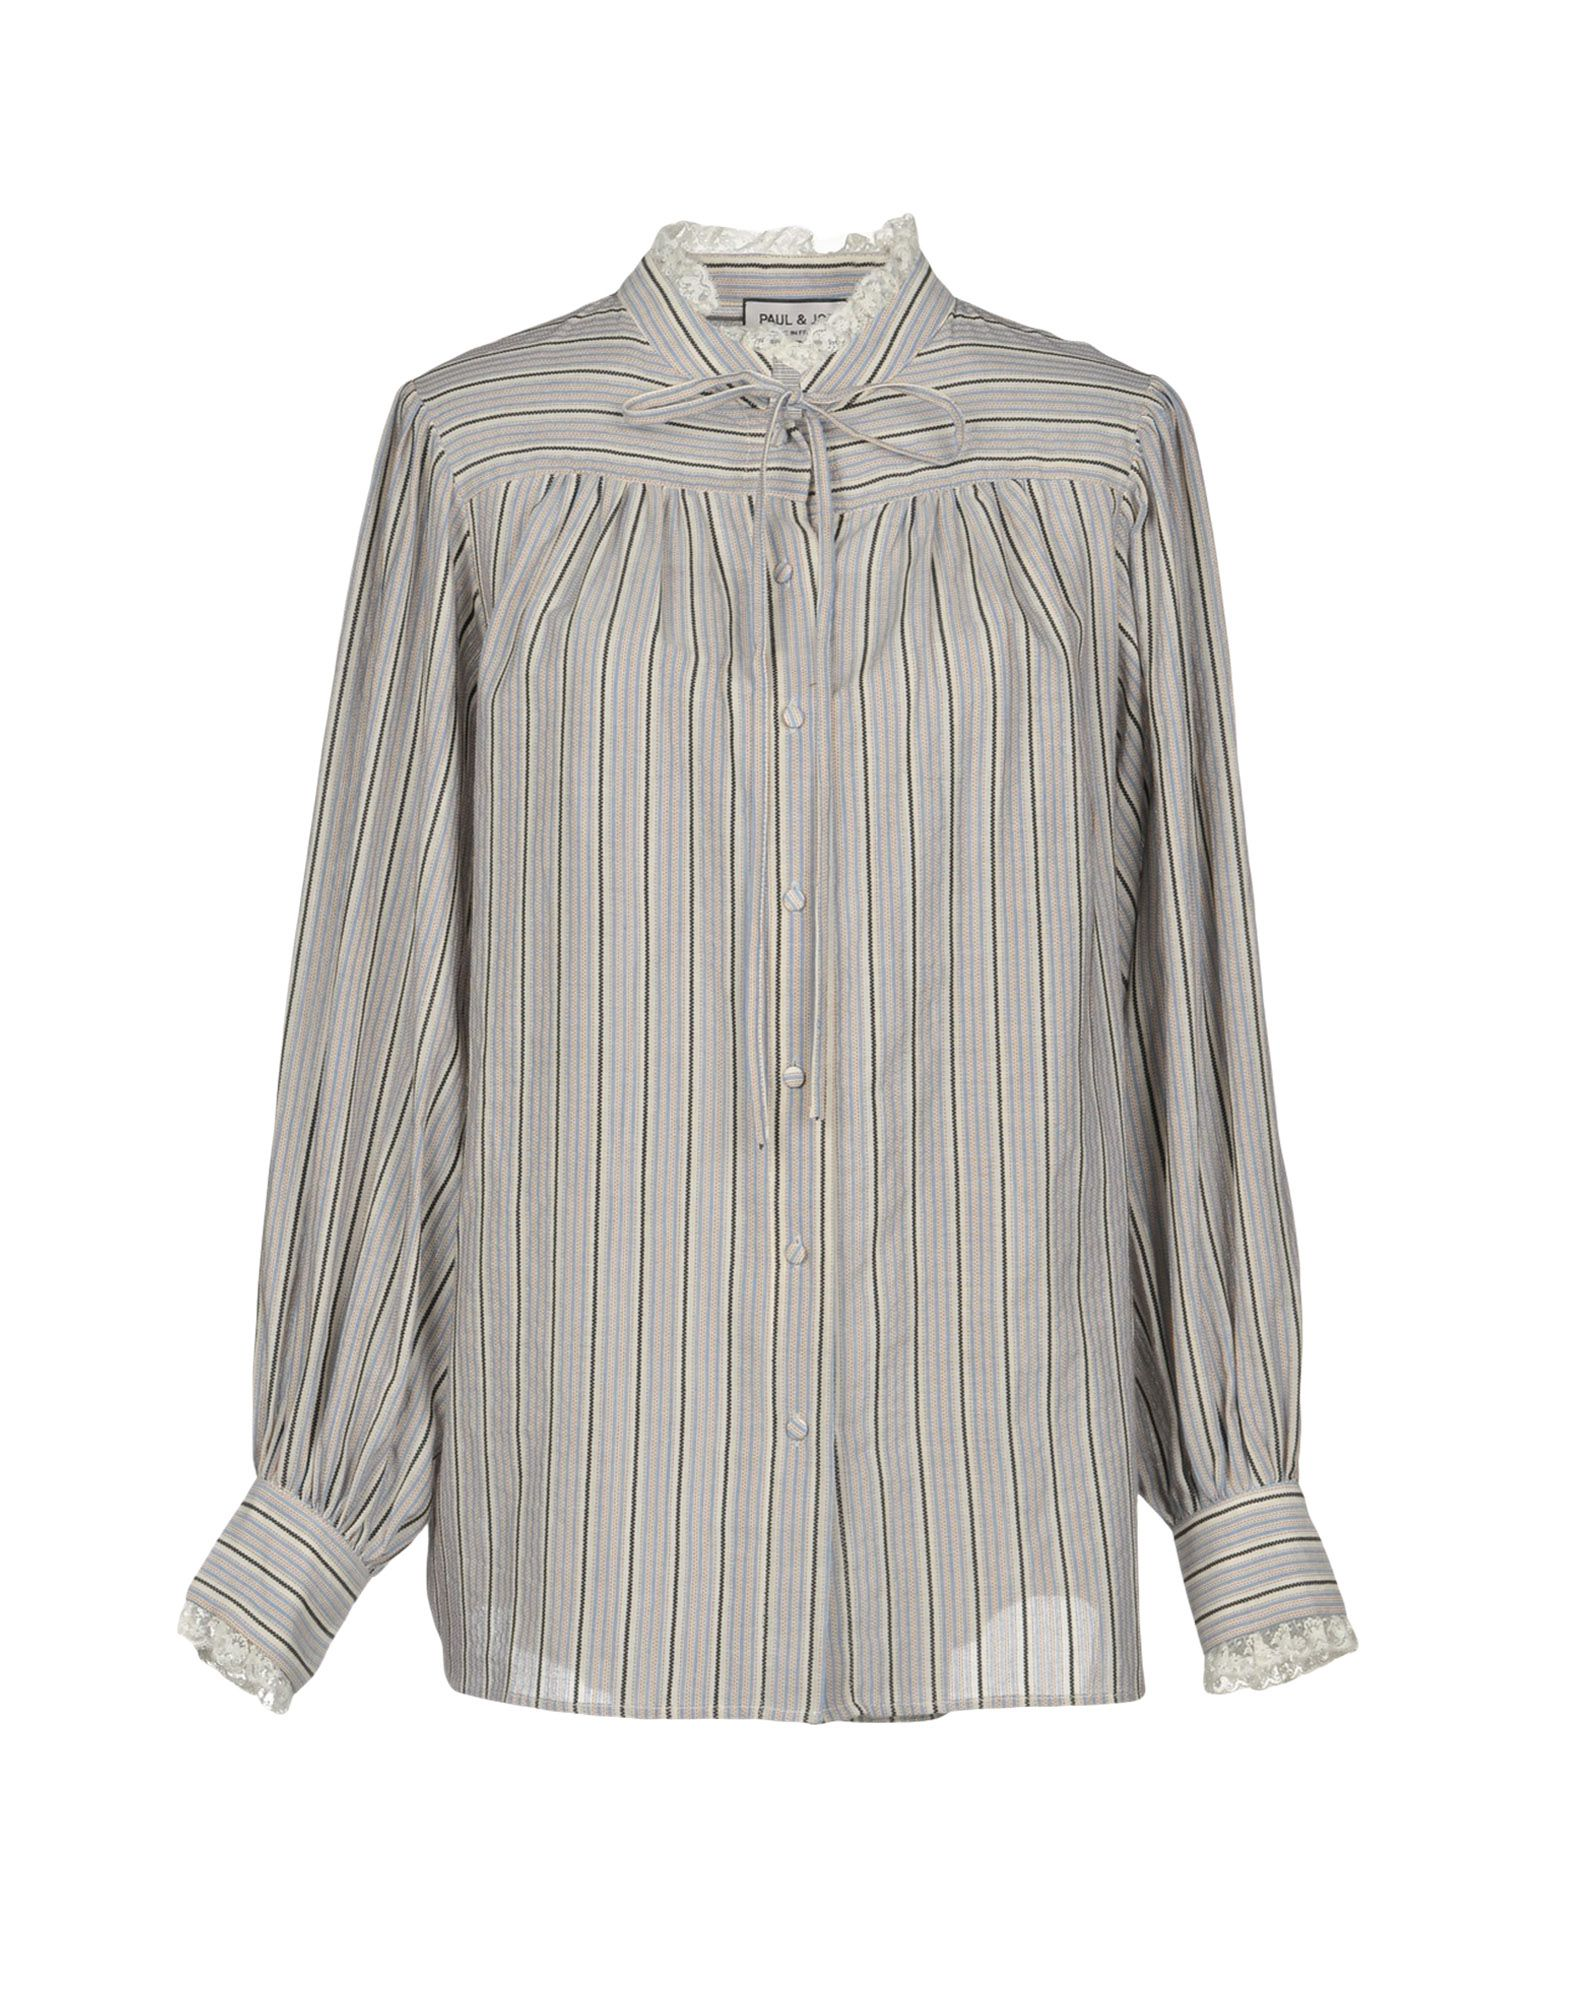 PAUL & JOE Pубашка ткань